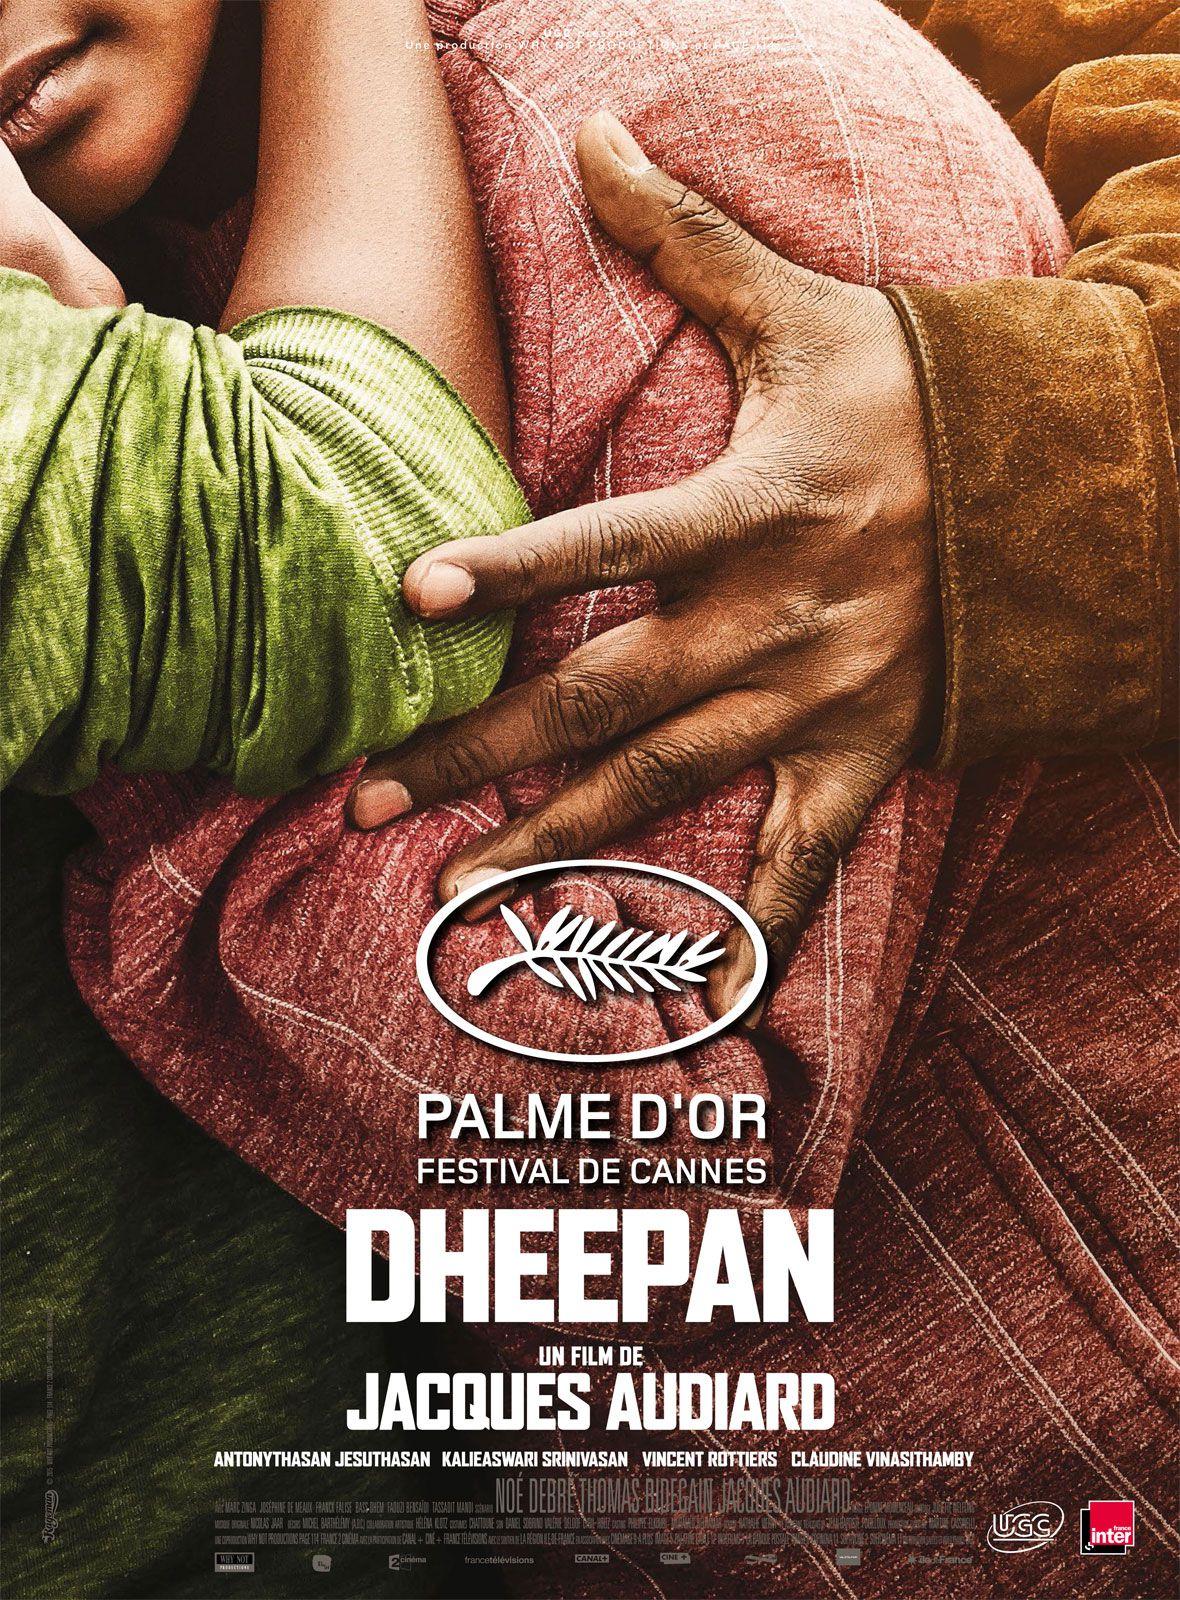 Dheepan - Film (2015)